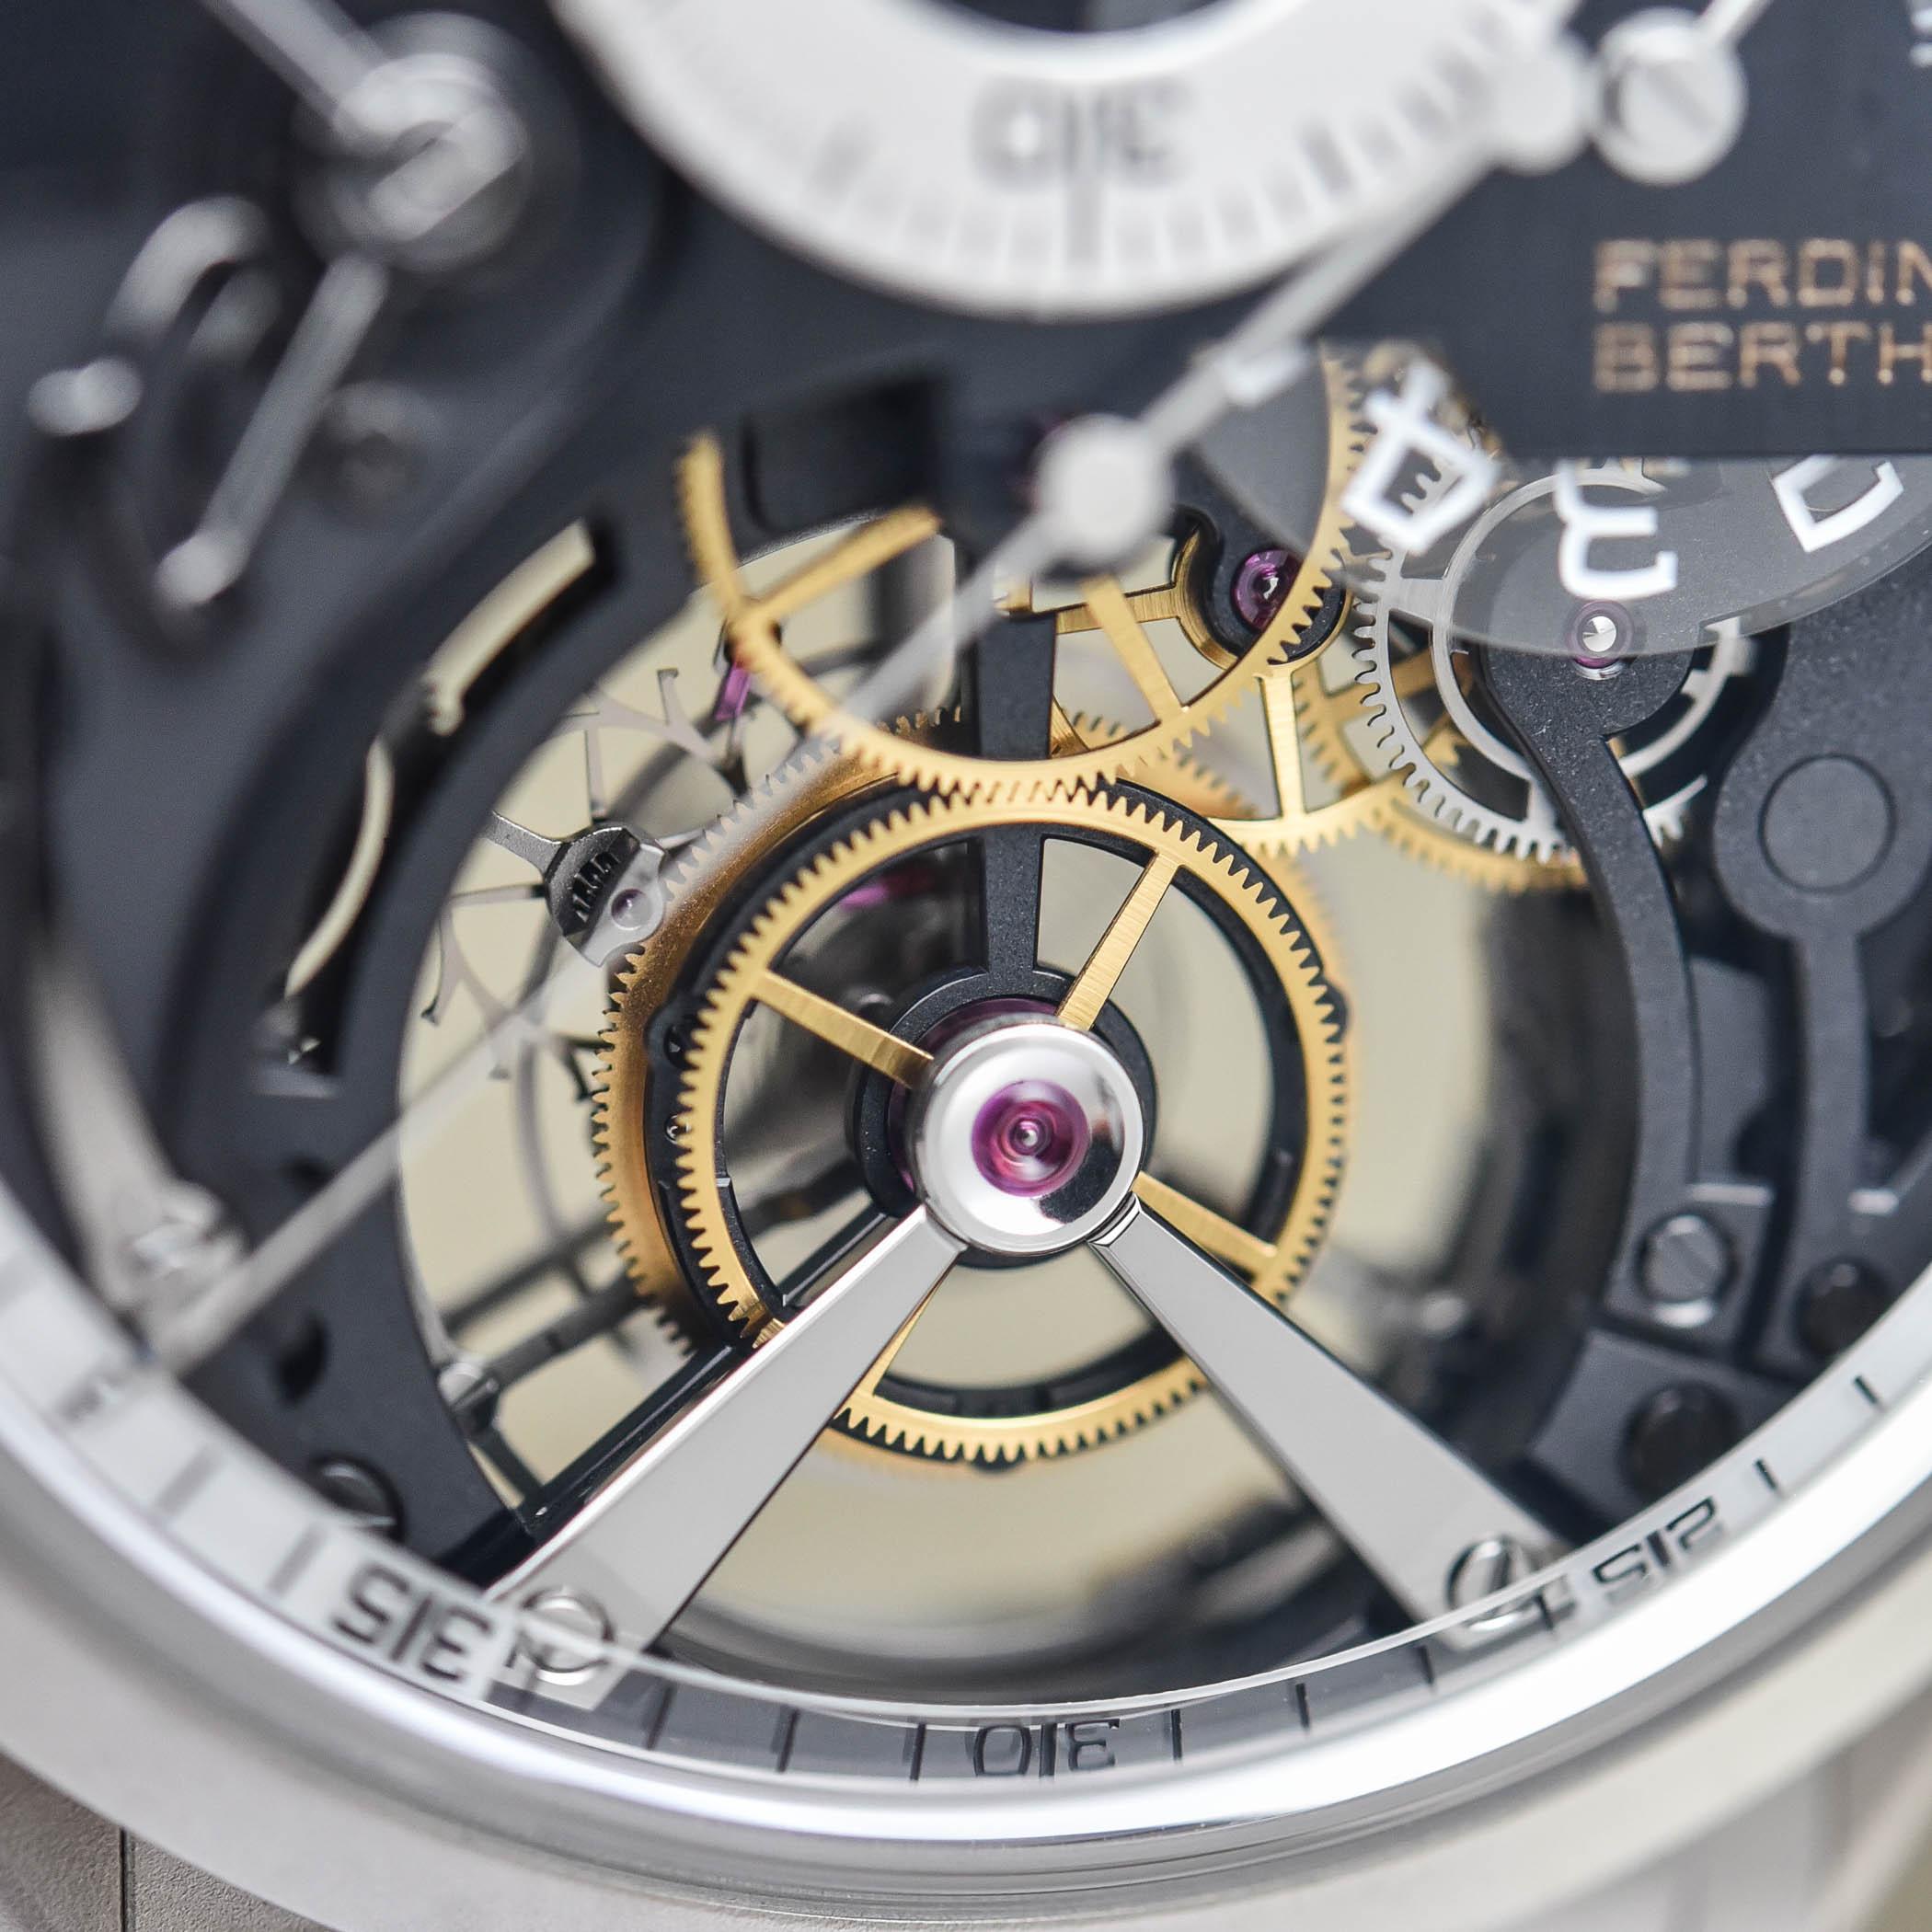 Ferdinand Berthoud Régulateur FB RS openworked - hands-on - 10